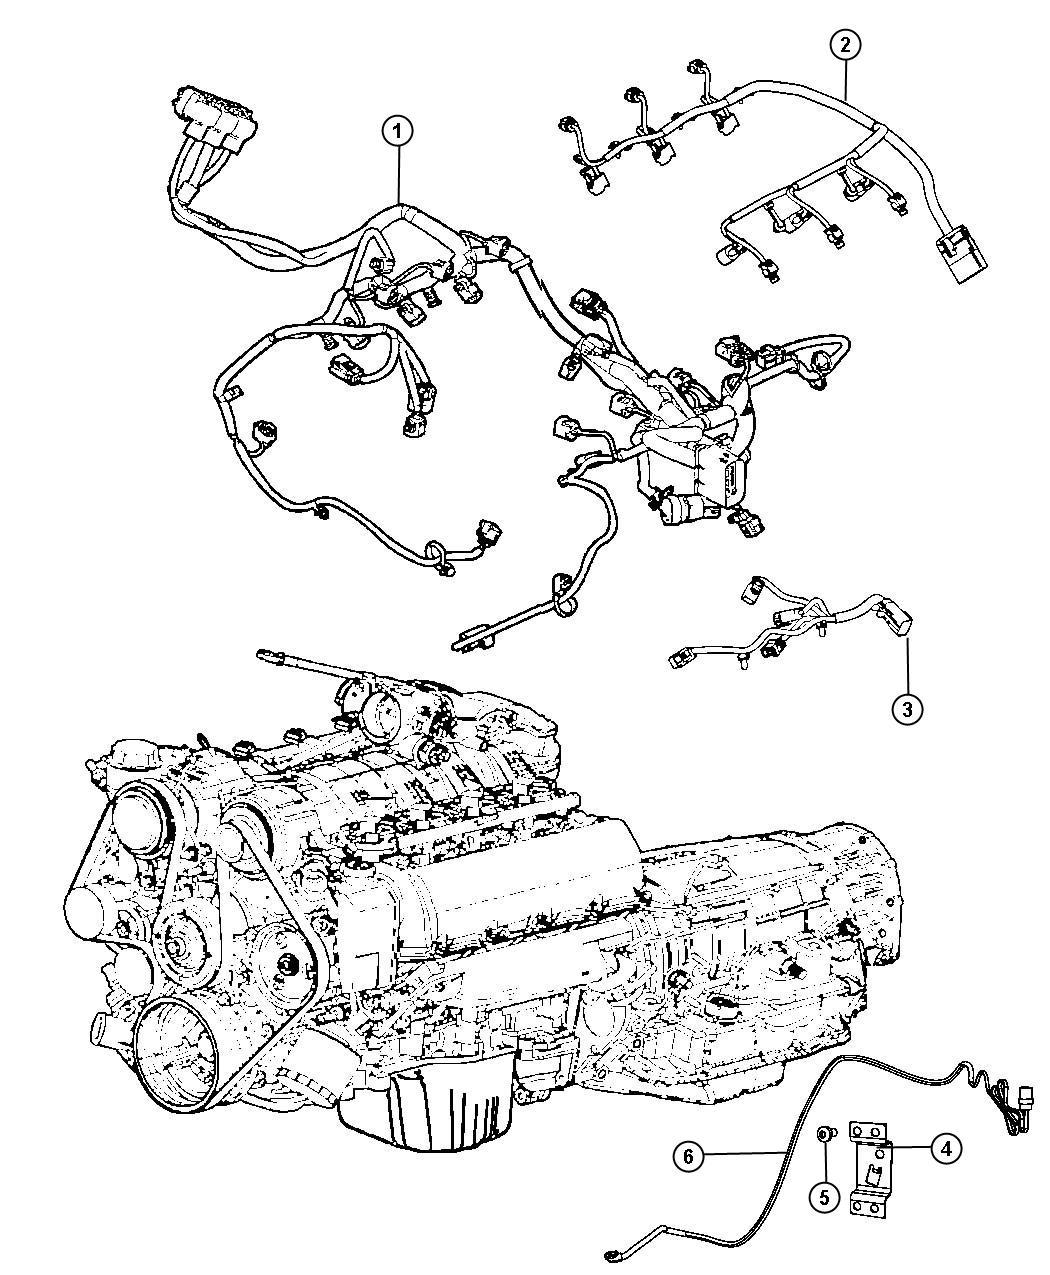 2012 Dodge Grand Caravan CREW 3.6L V6 Wiring. Injector